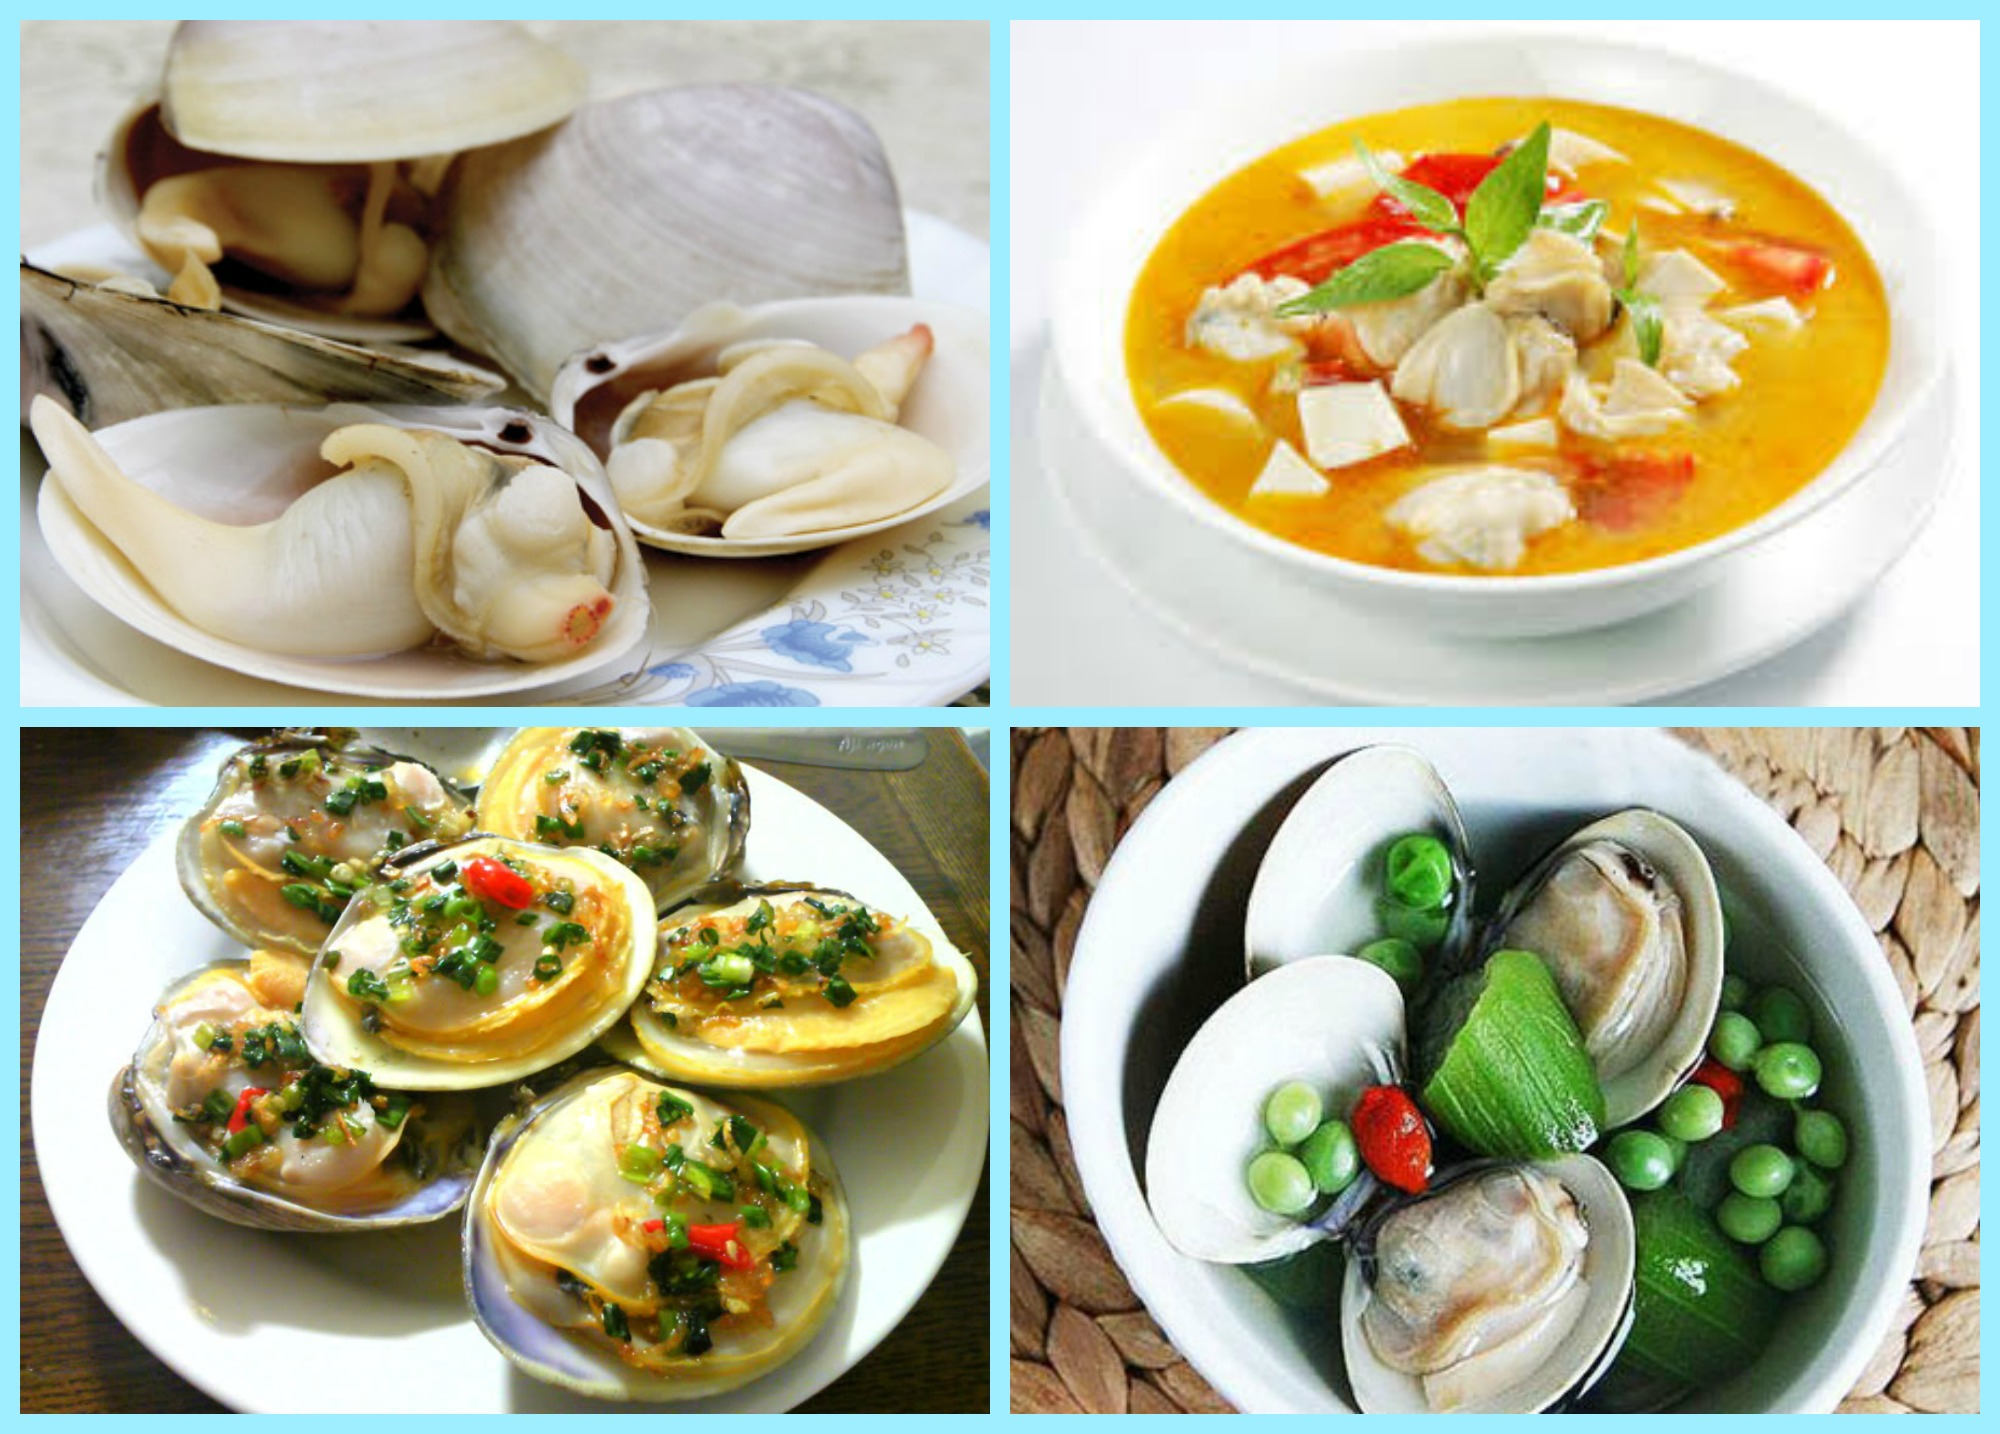 halong_bay_seafood_3